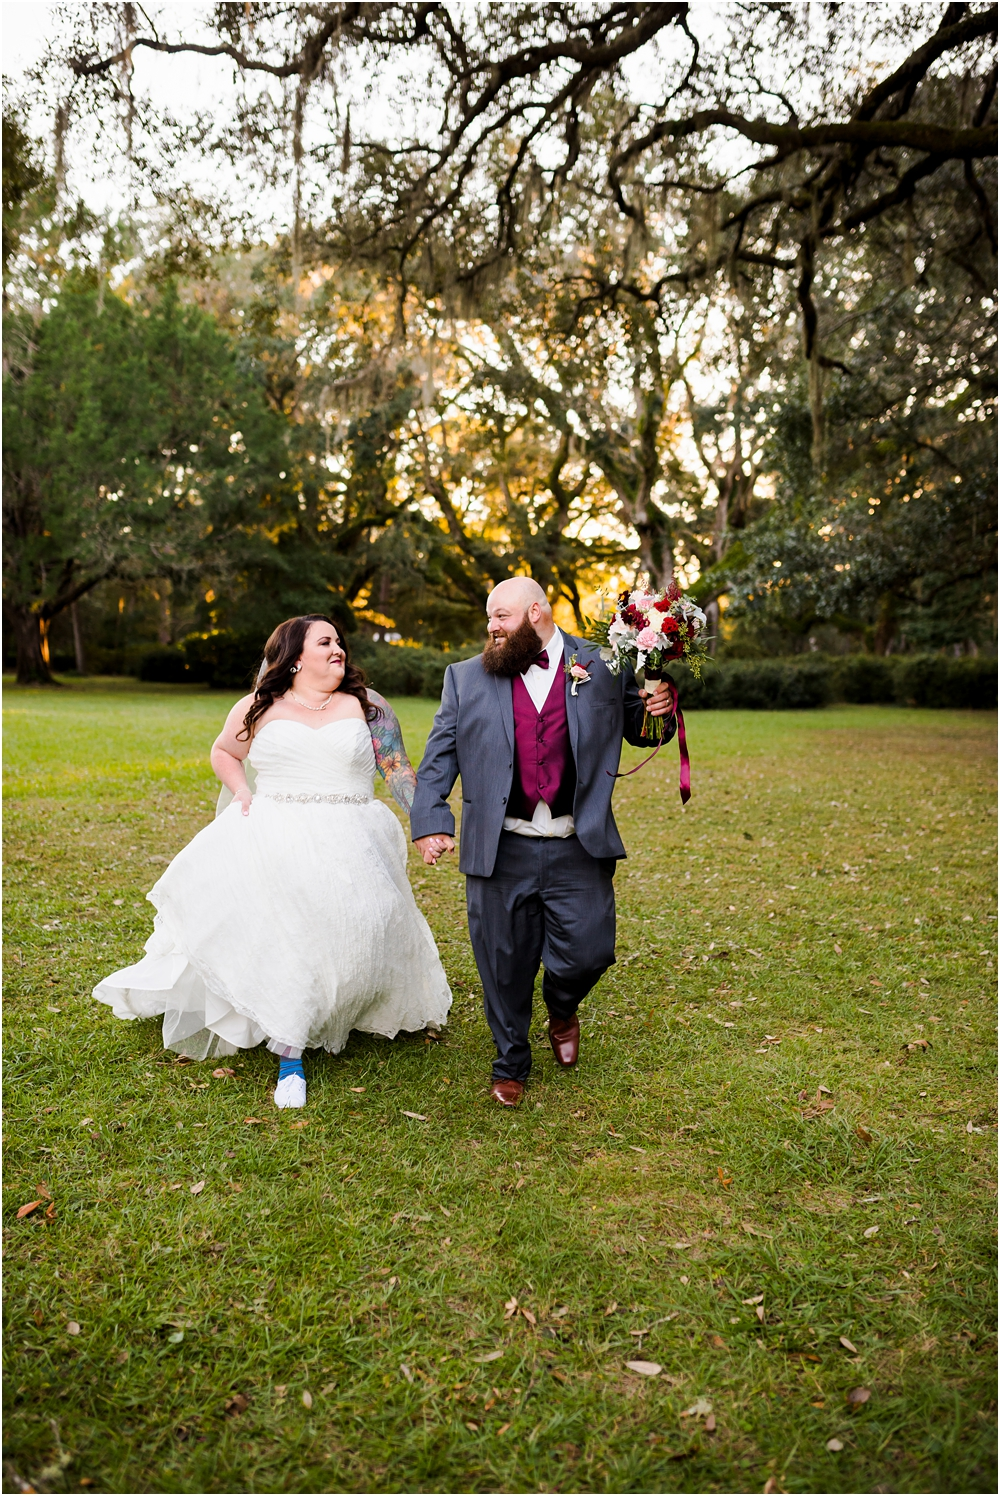 Eden-Gardens-florida-wedding-photographer-kiersten-stevenson-photography-98.jpg